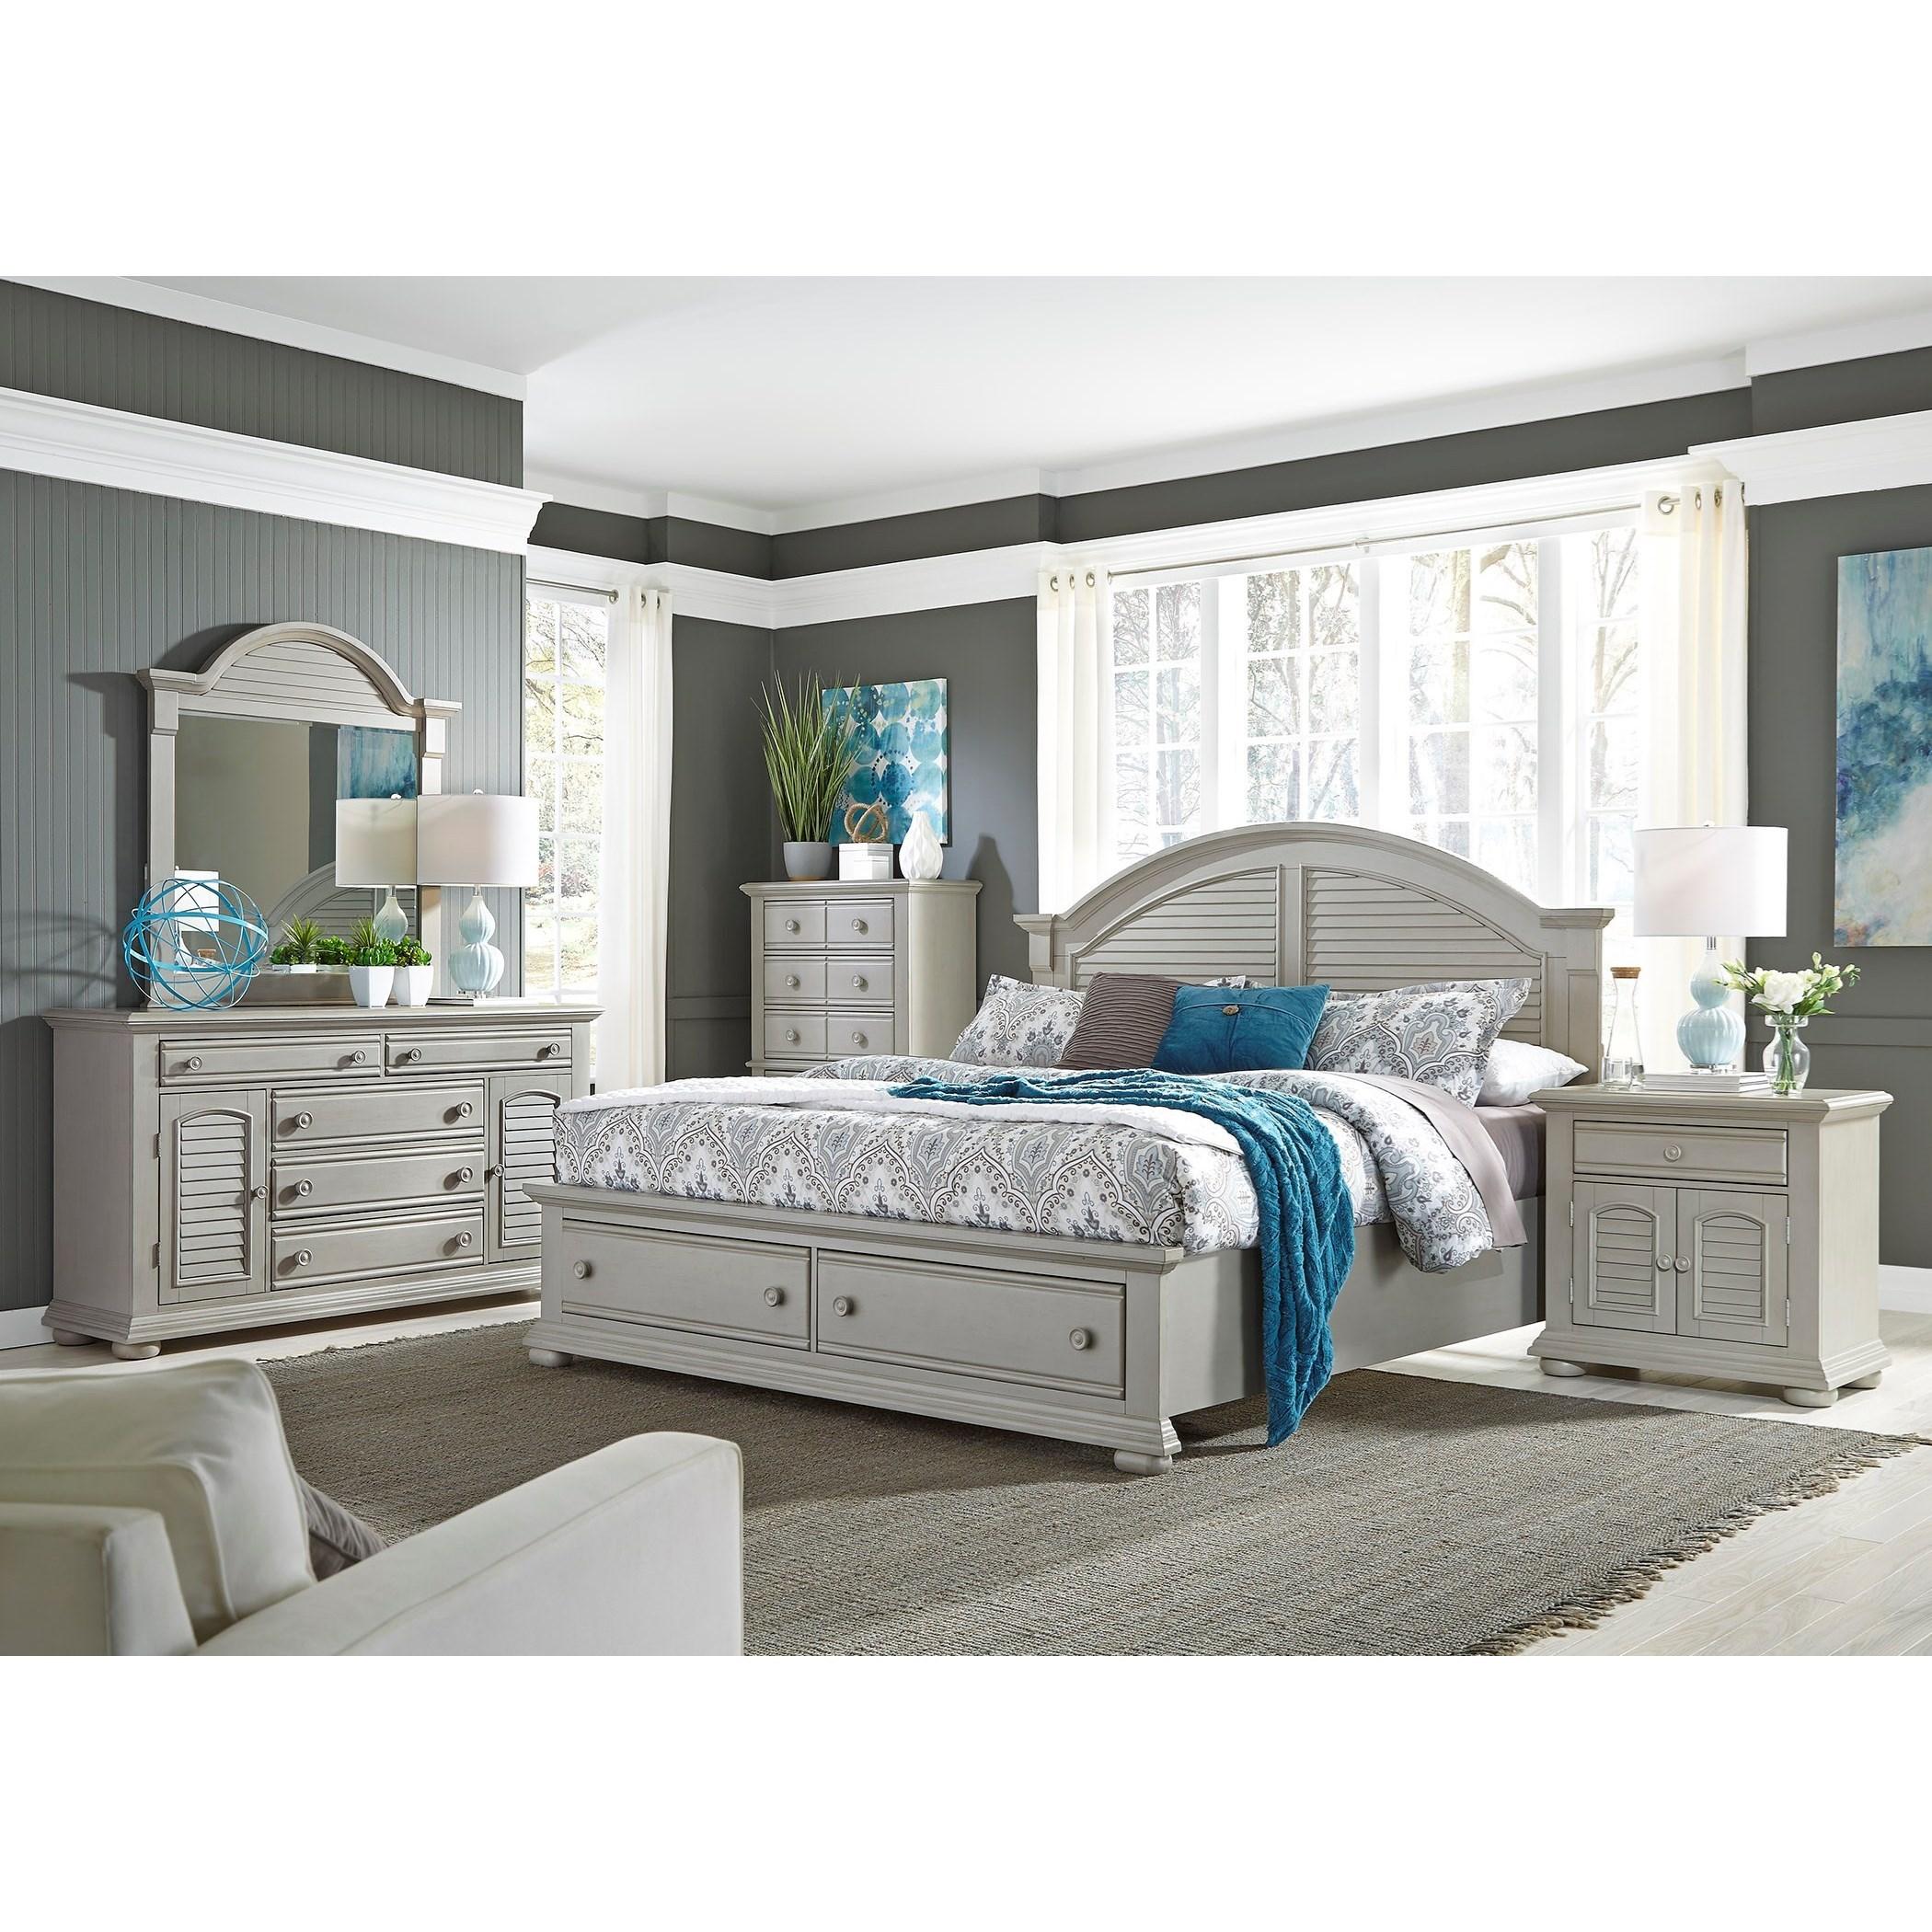 Liberty Furniture Summer House Ii 407 Br32 2 Door 5 Drawer Dresser Furniture And Appliancemart